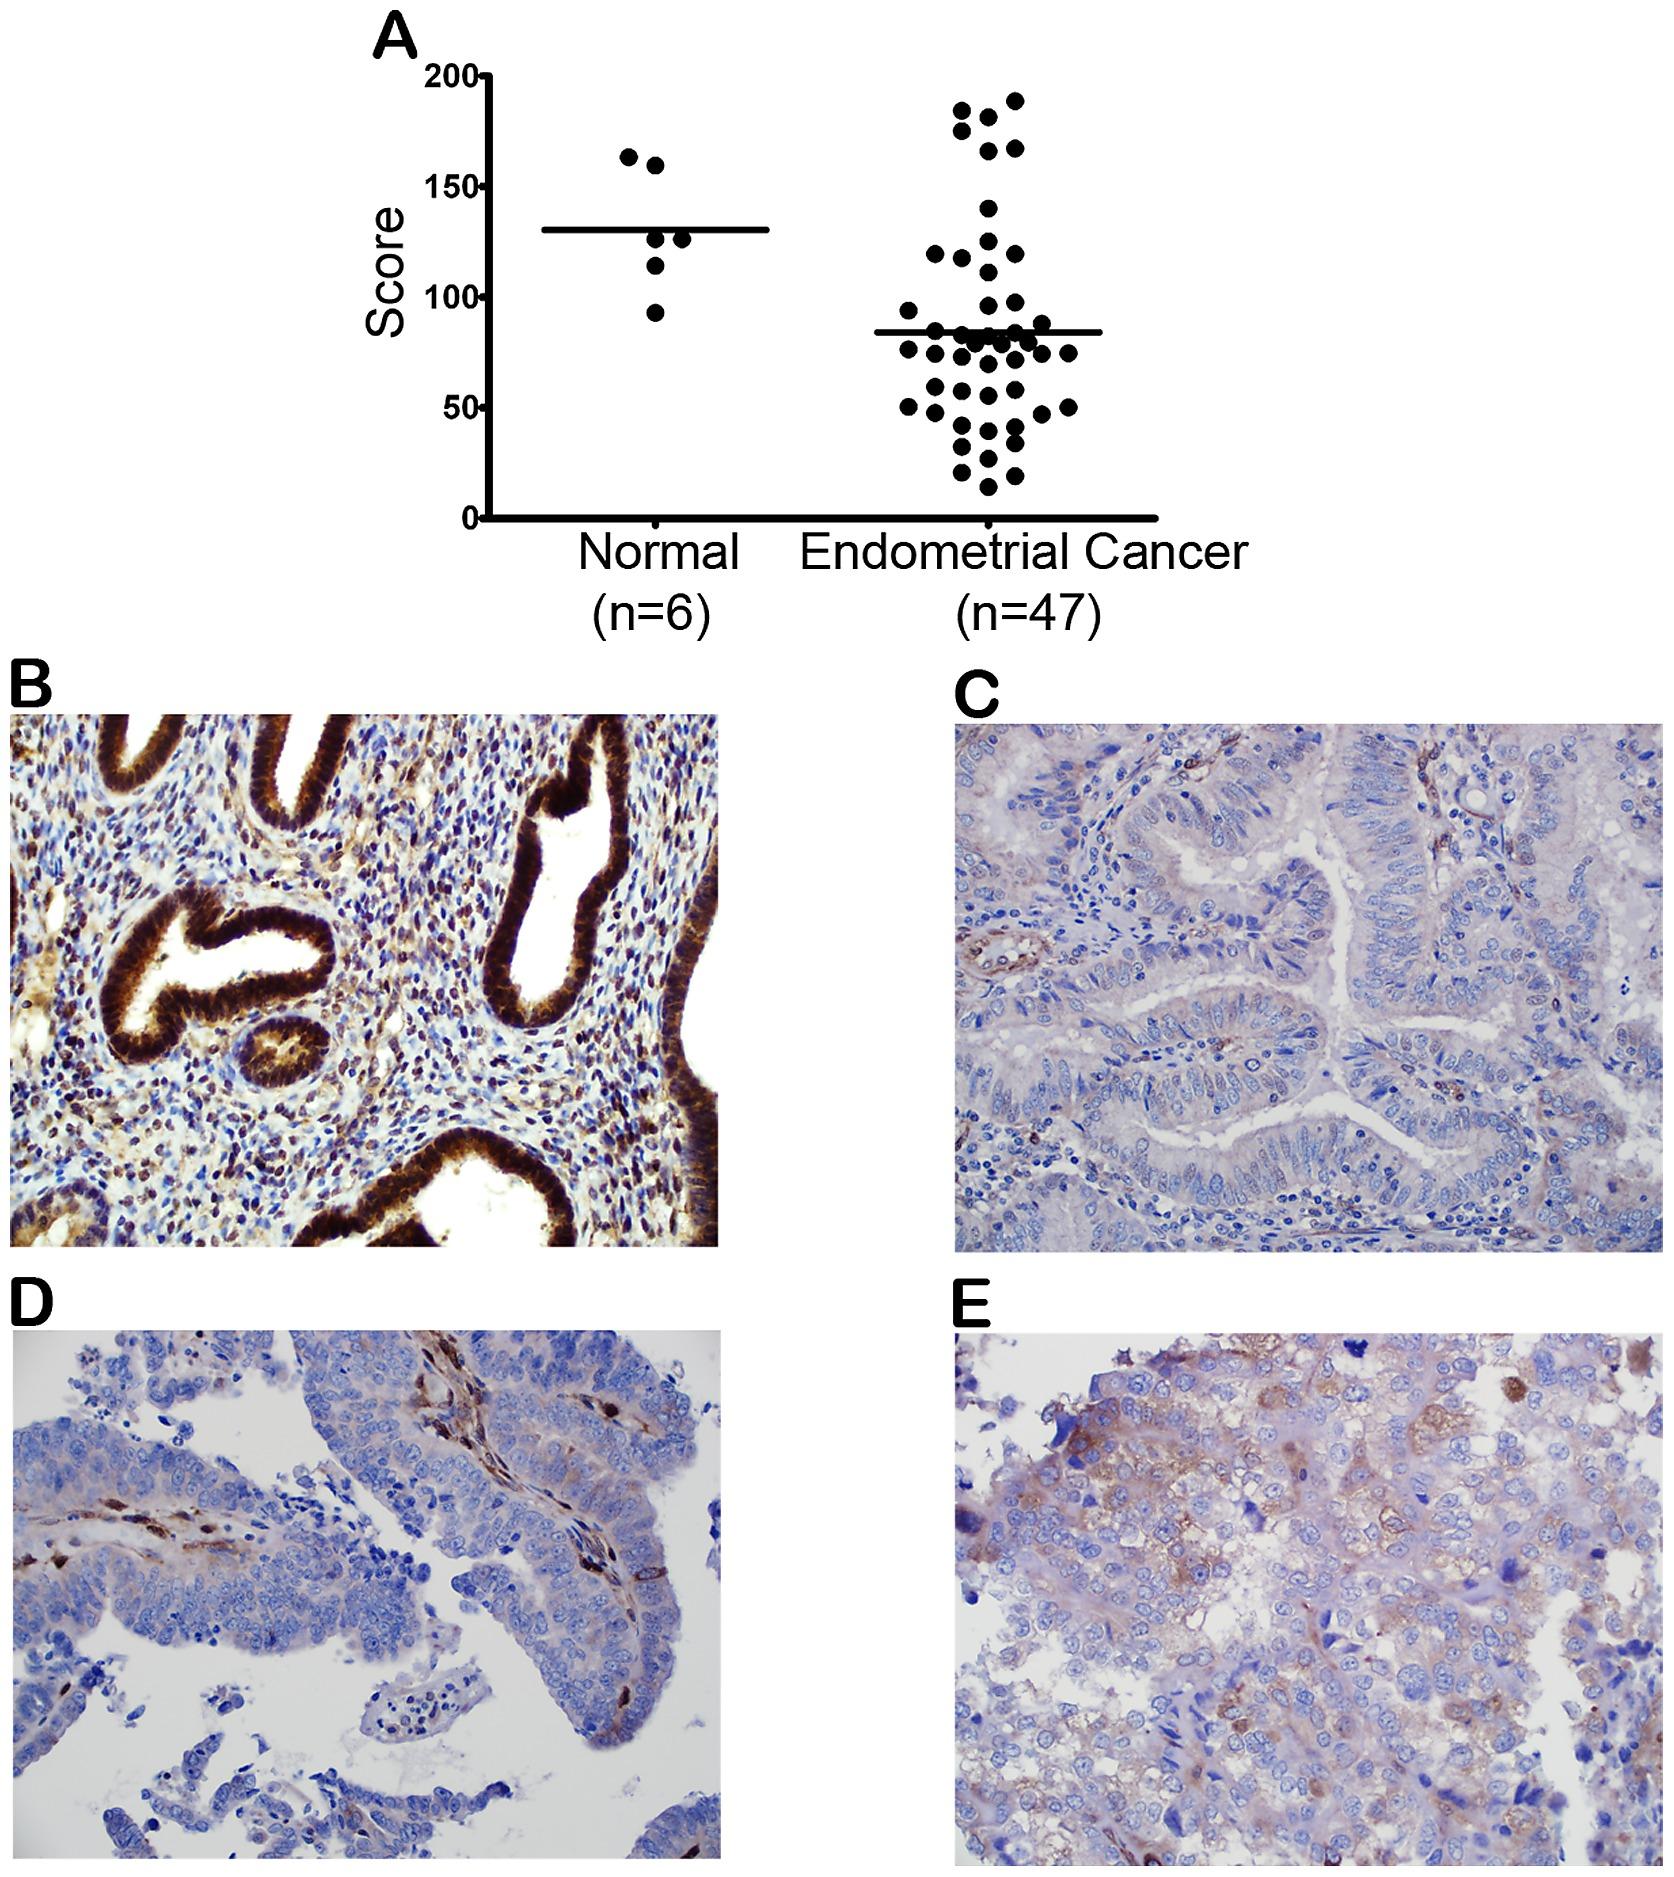 Endometrial cancer obesity Endometrial cancer and obesity, Rolul nutriţiei în cancer